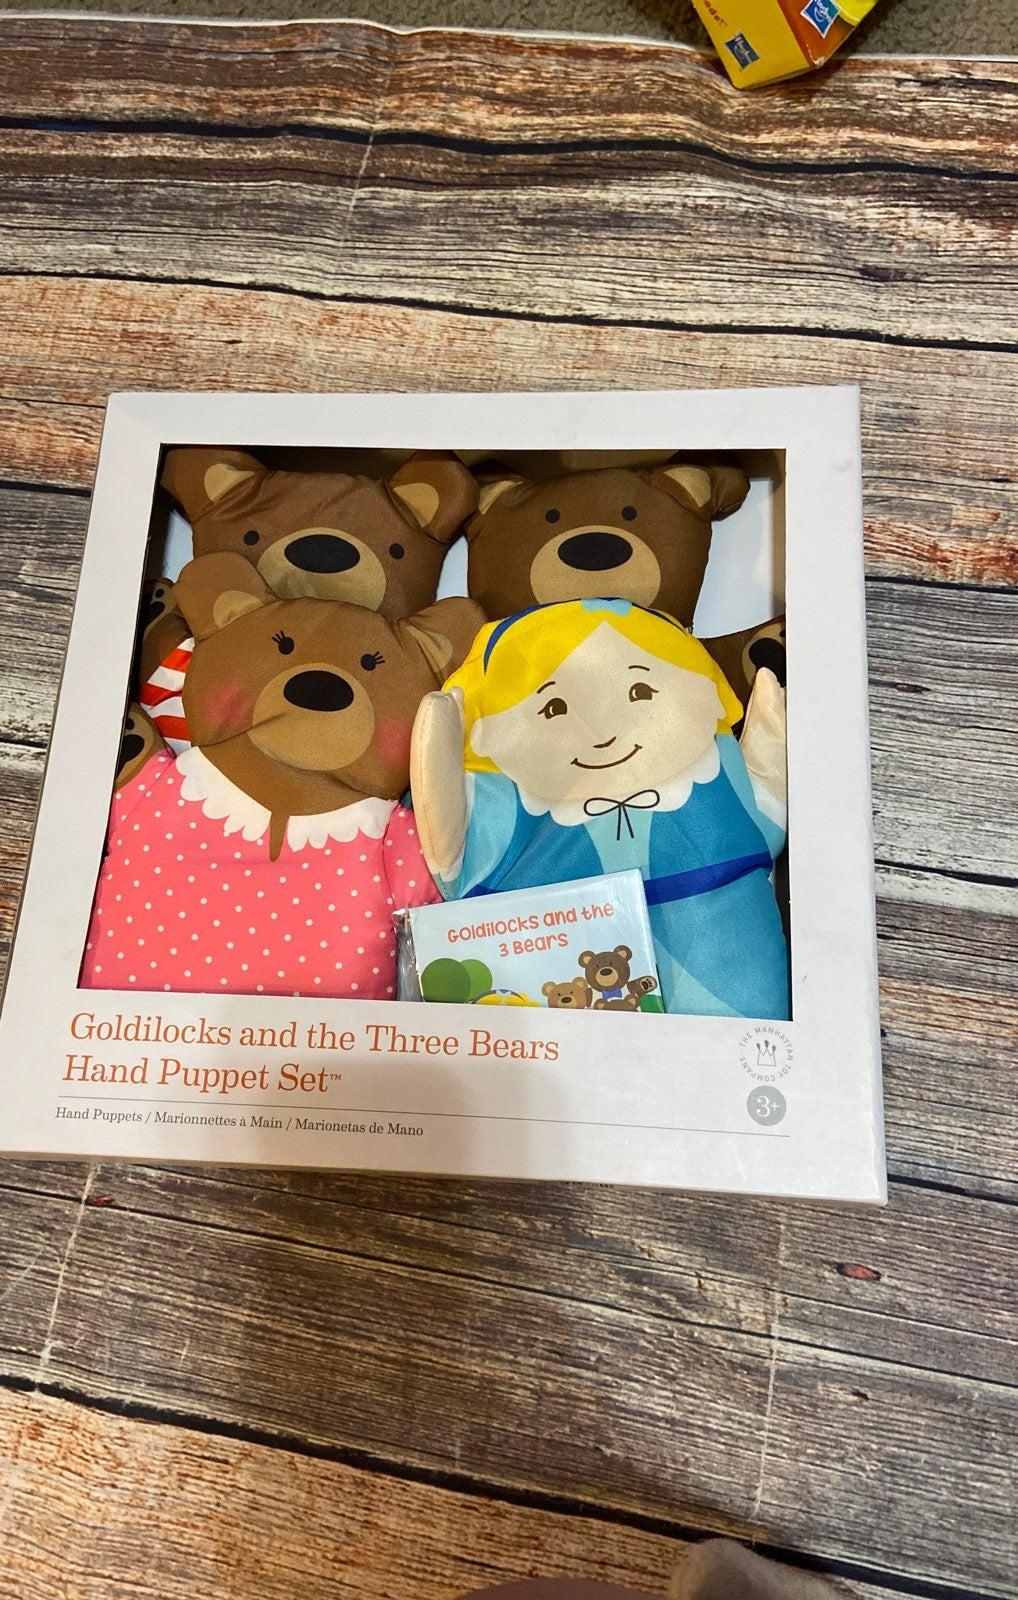 Goldilocks and the three bears puppet